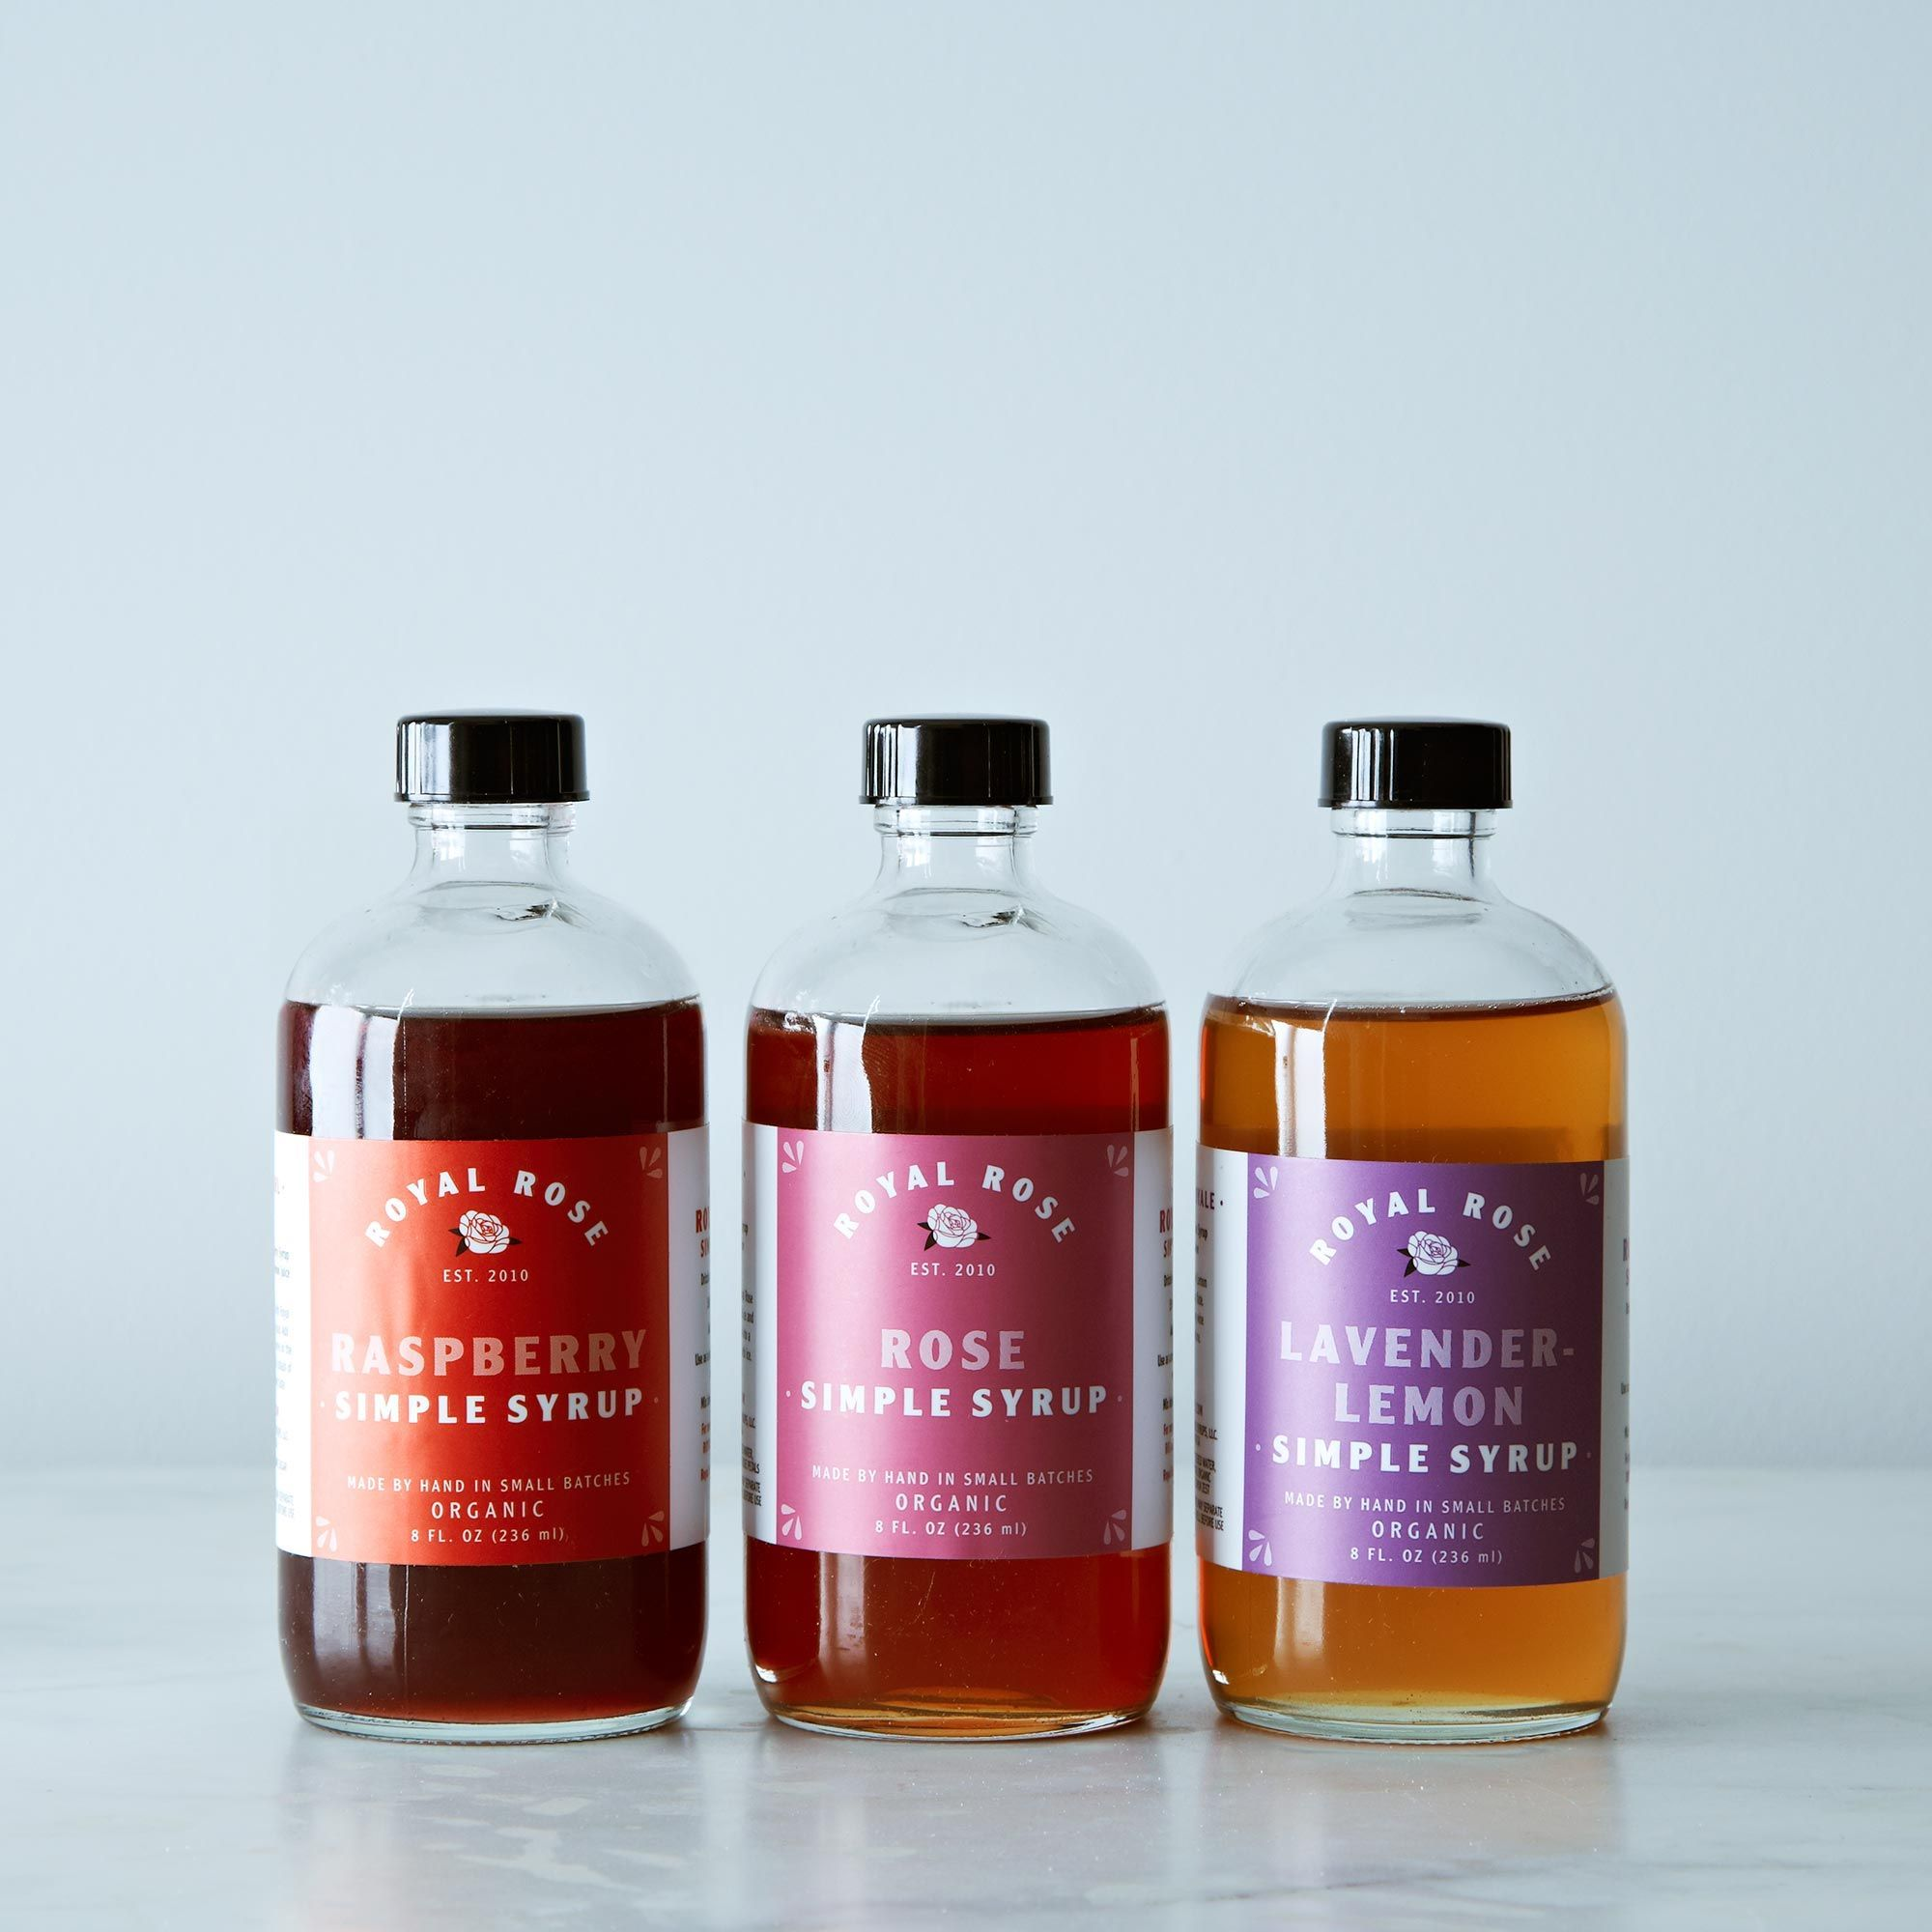 76523514 1dea 49d0 8eff 2102dc913338  2013 0729 royal rose simple syrup raspberry rose lavendar bundle 002